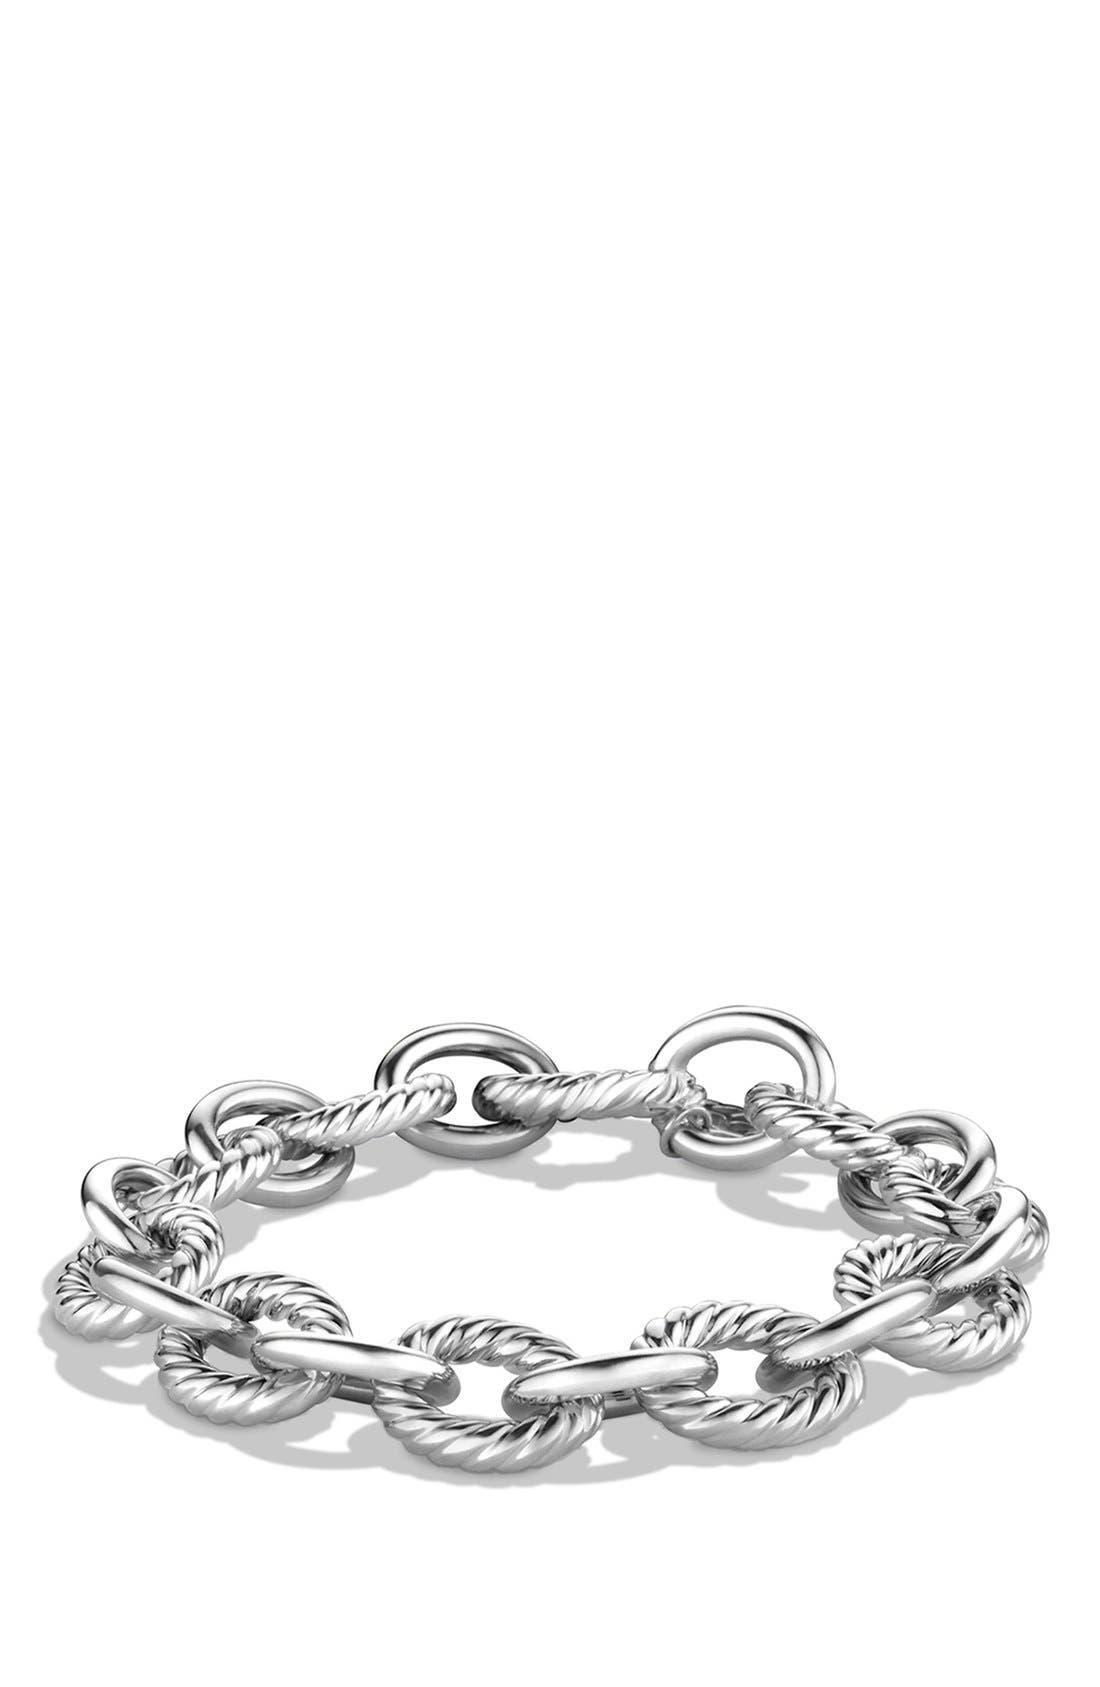 david yurman large link bracelet